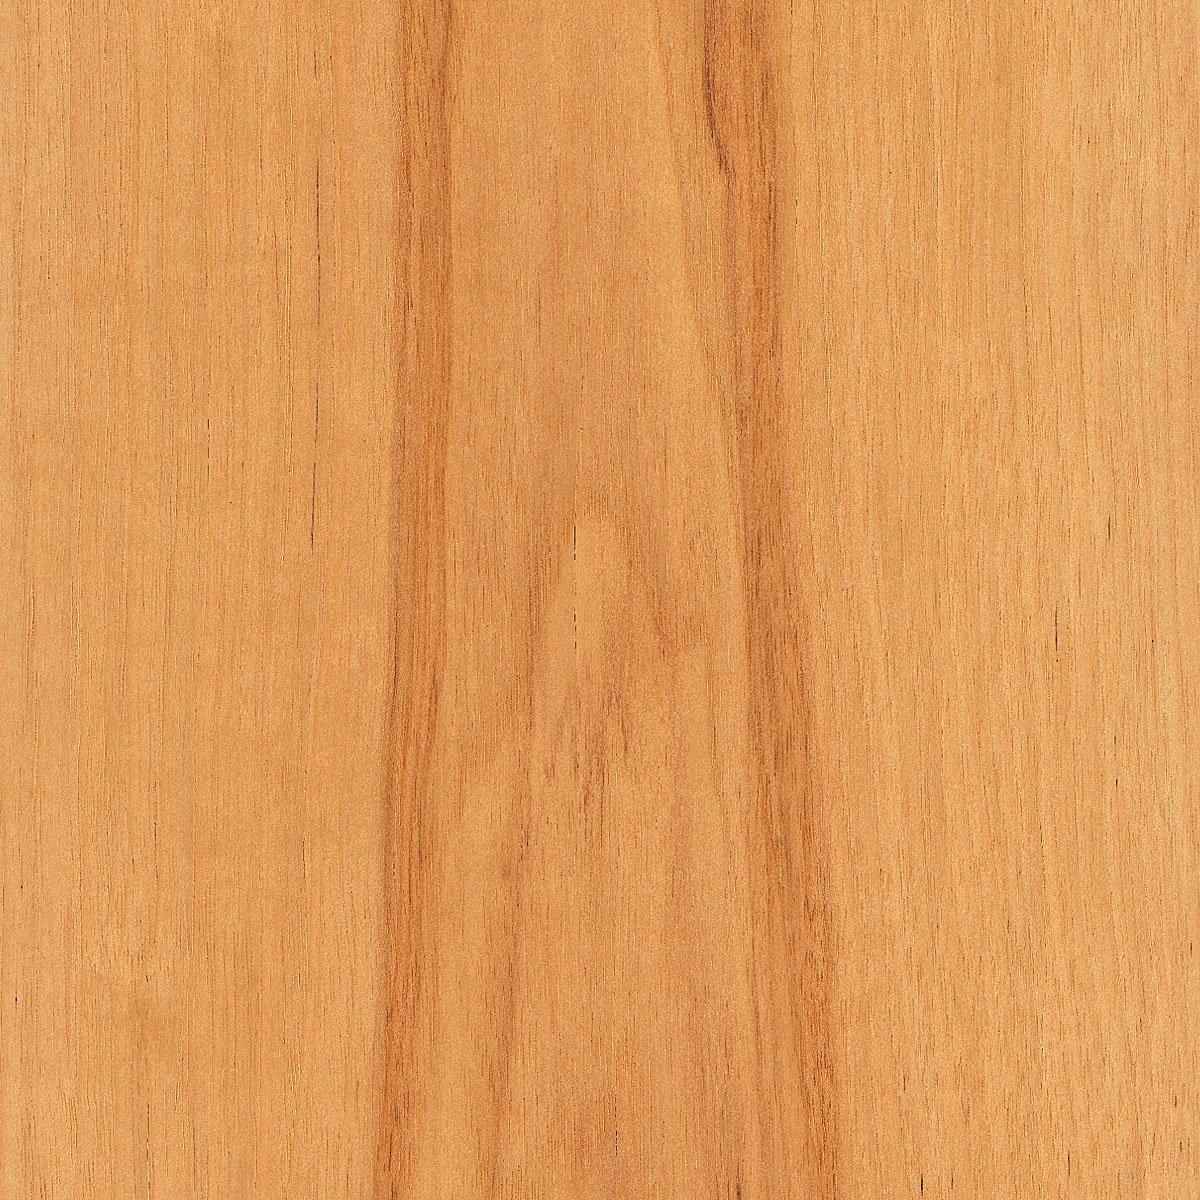 Hickory Wood Veneer Plain Sliced Calico 2'x8' 10 mil Sheet